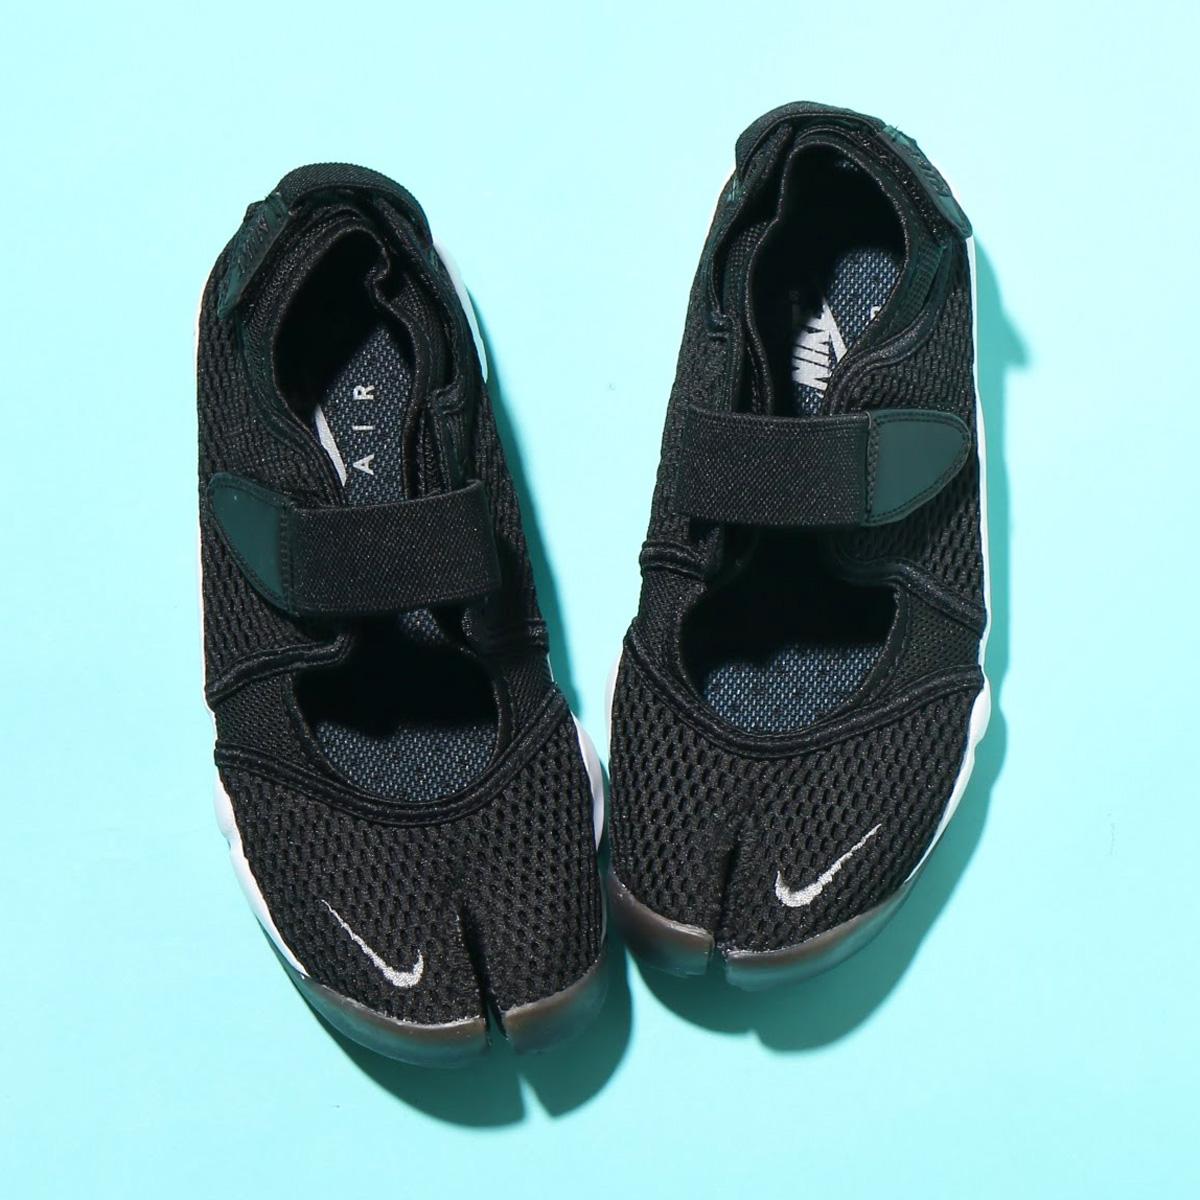 buy popular 5e4d1 8f924 NIKE WMNS AIR RIFT BR (Nike women airlift breeze) BLACK COOL GREY- ...